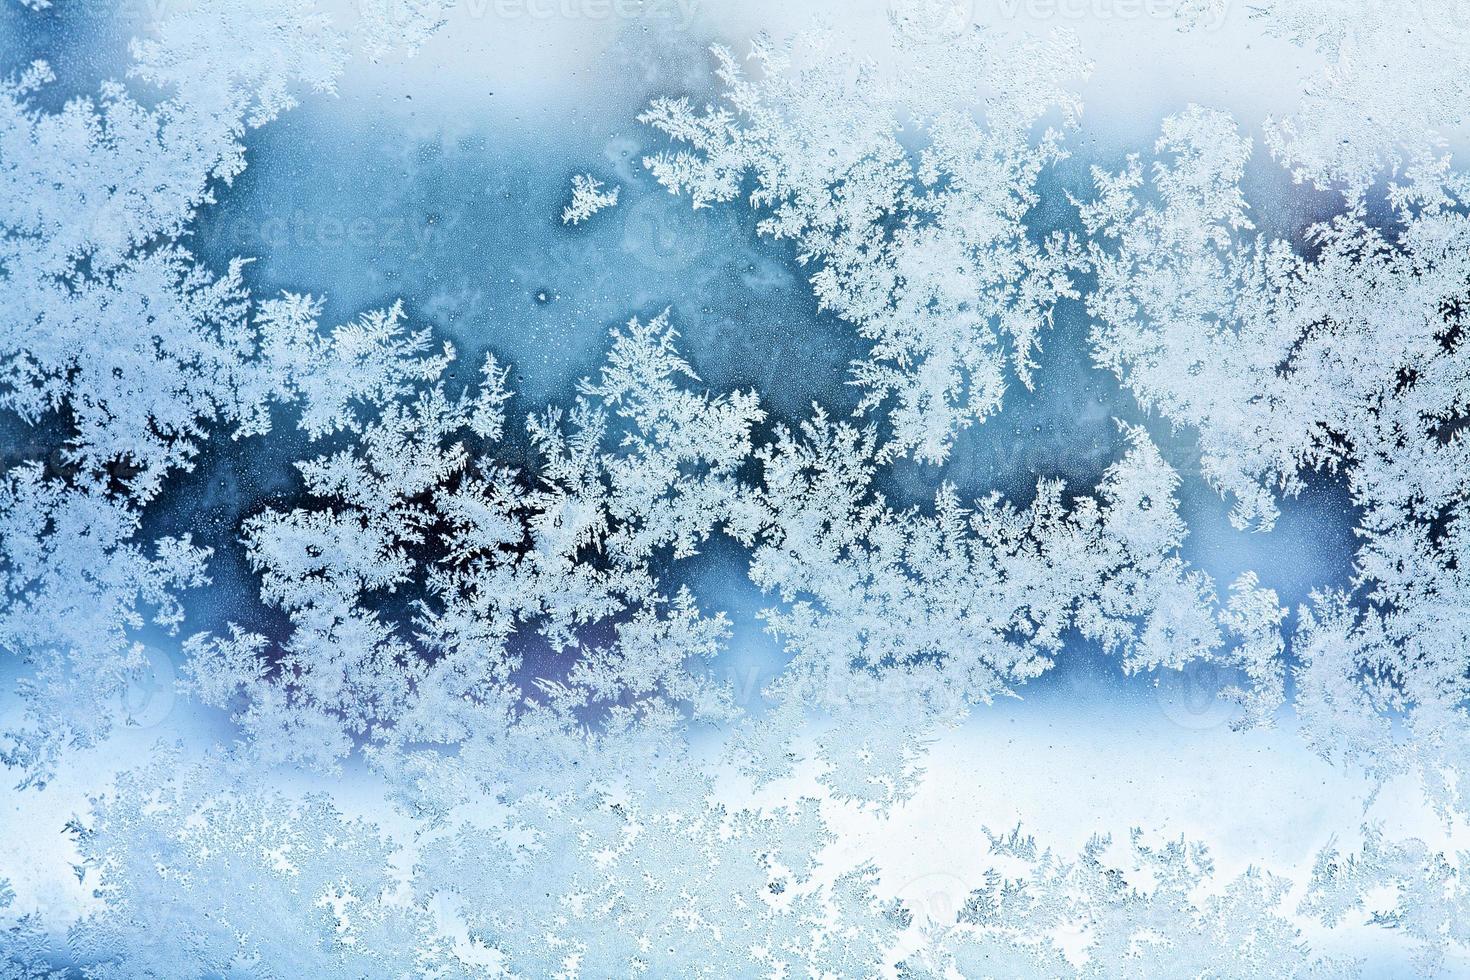 vinteris abstrakt bakgrund foto